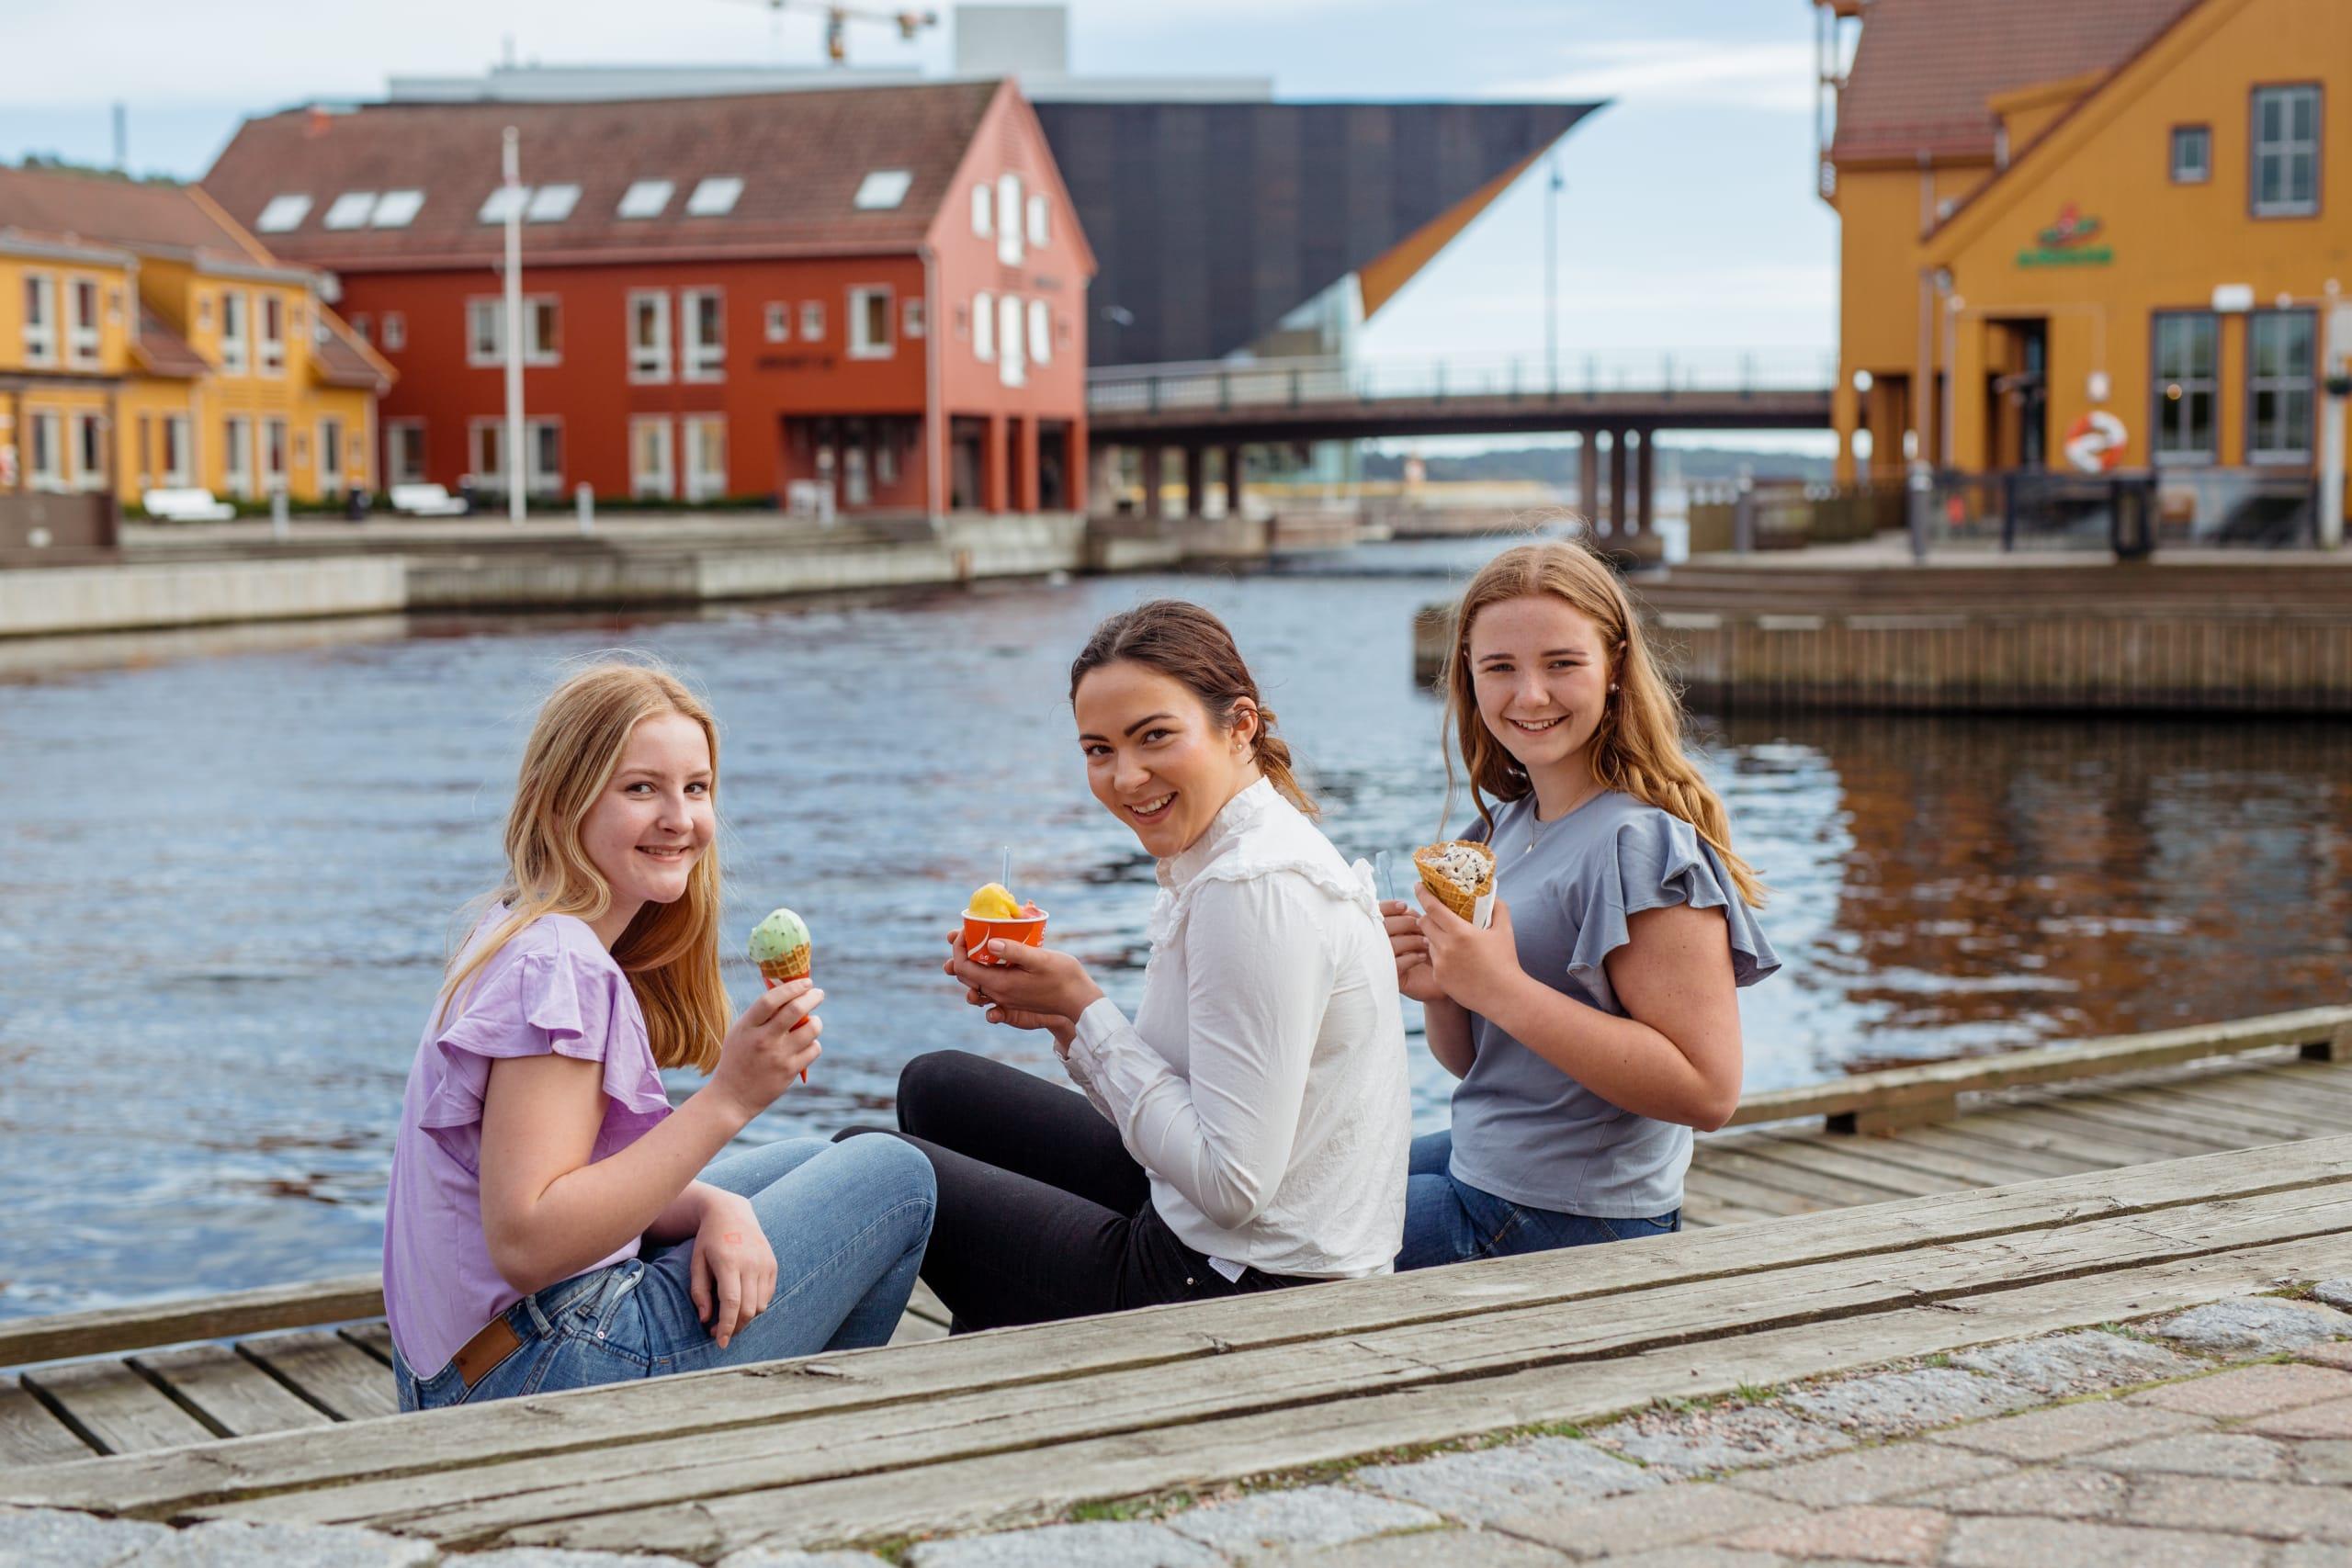 Three friends eating ice cream in Kristiansand